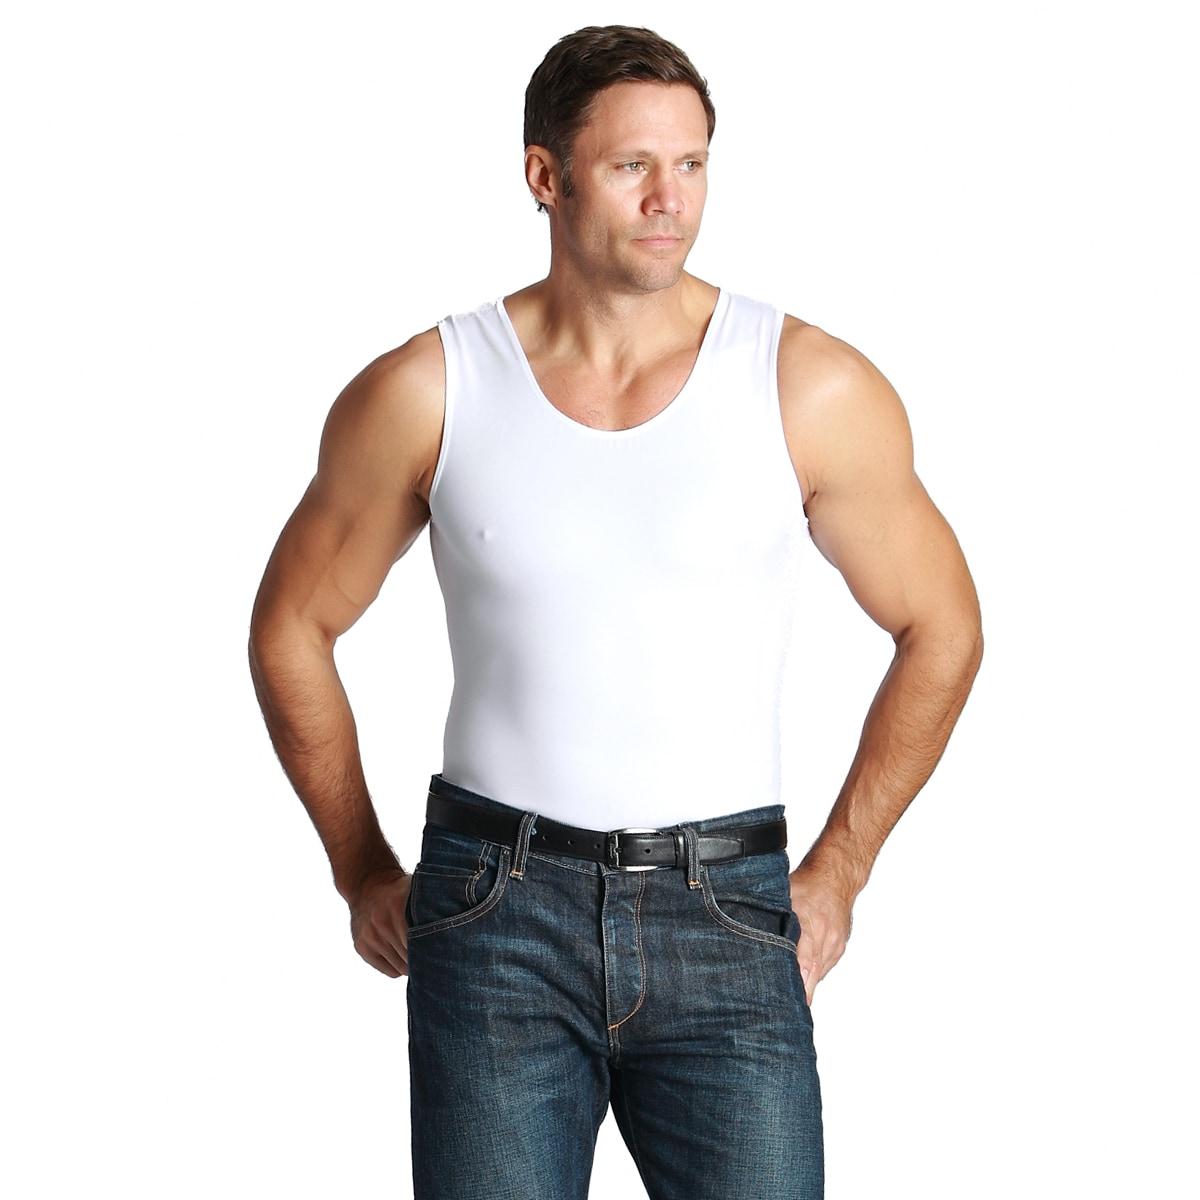 388af9cfaf9e6 Shop Insta Slim Men s Compression Tank Shirts (Pack of 3) - Free Shipping  Today - Overstock - 7717541